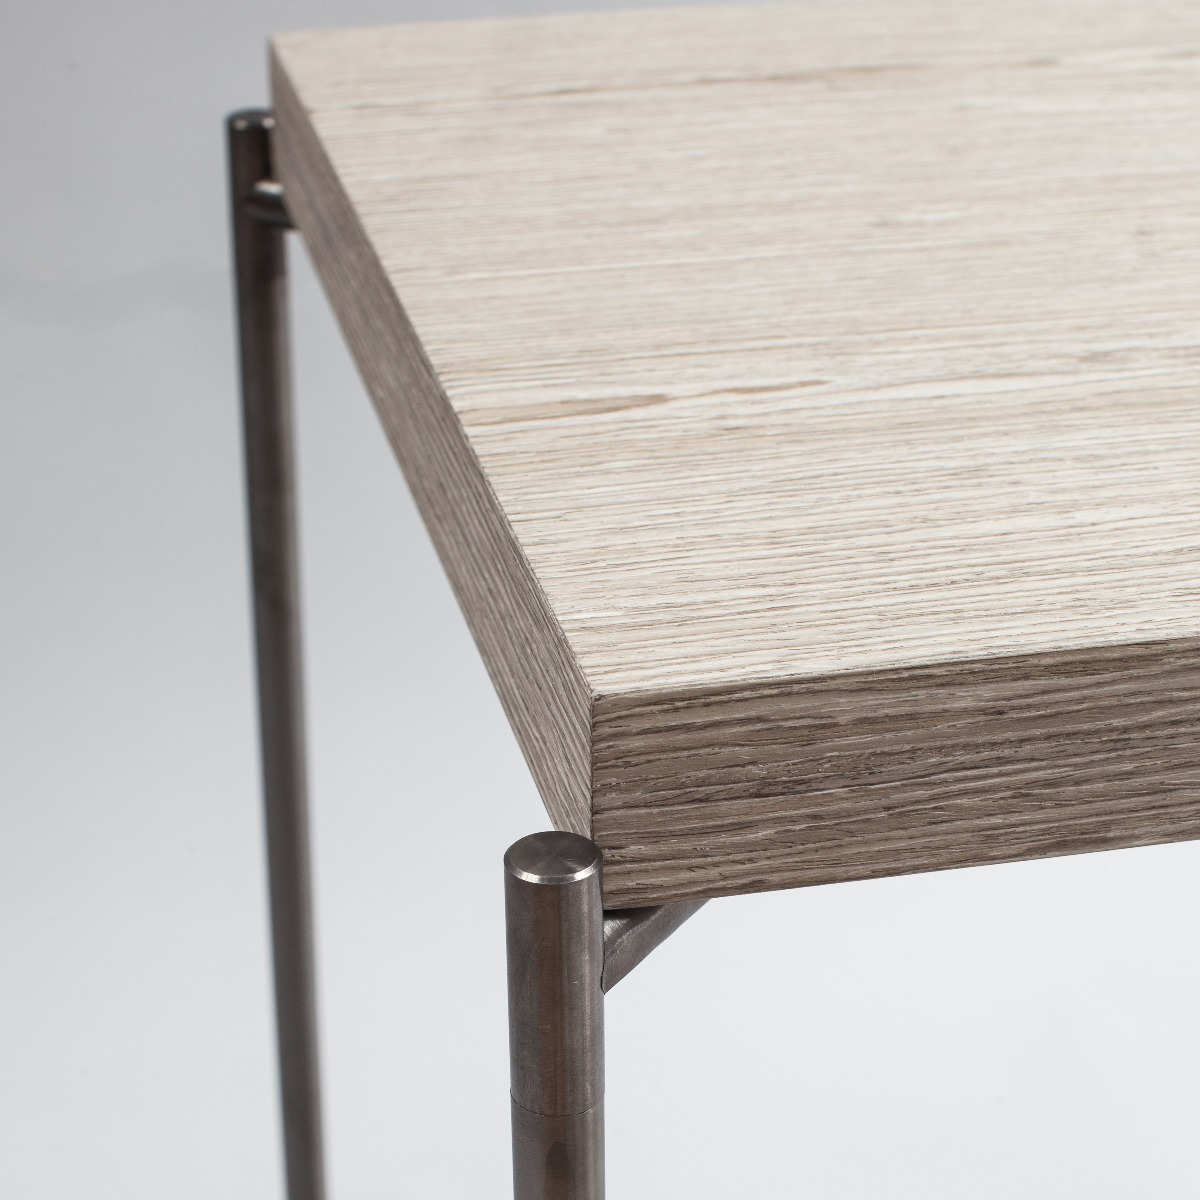 Wood Veneer - Care Instructions